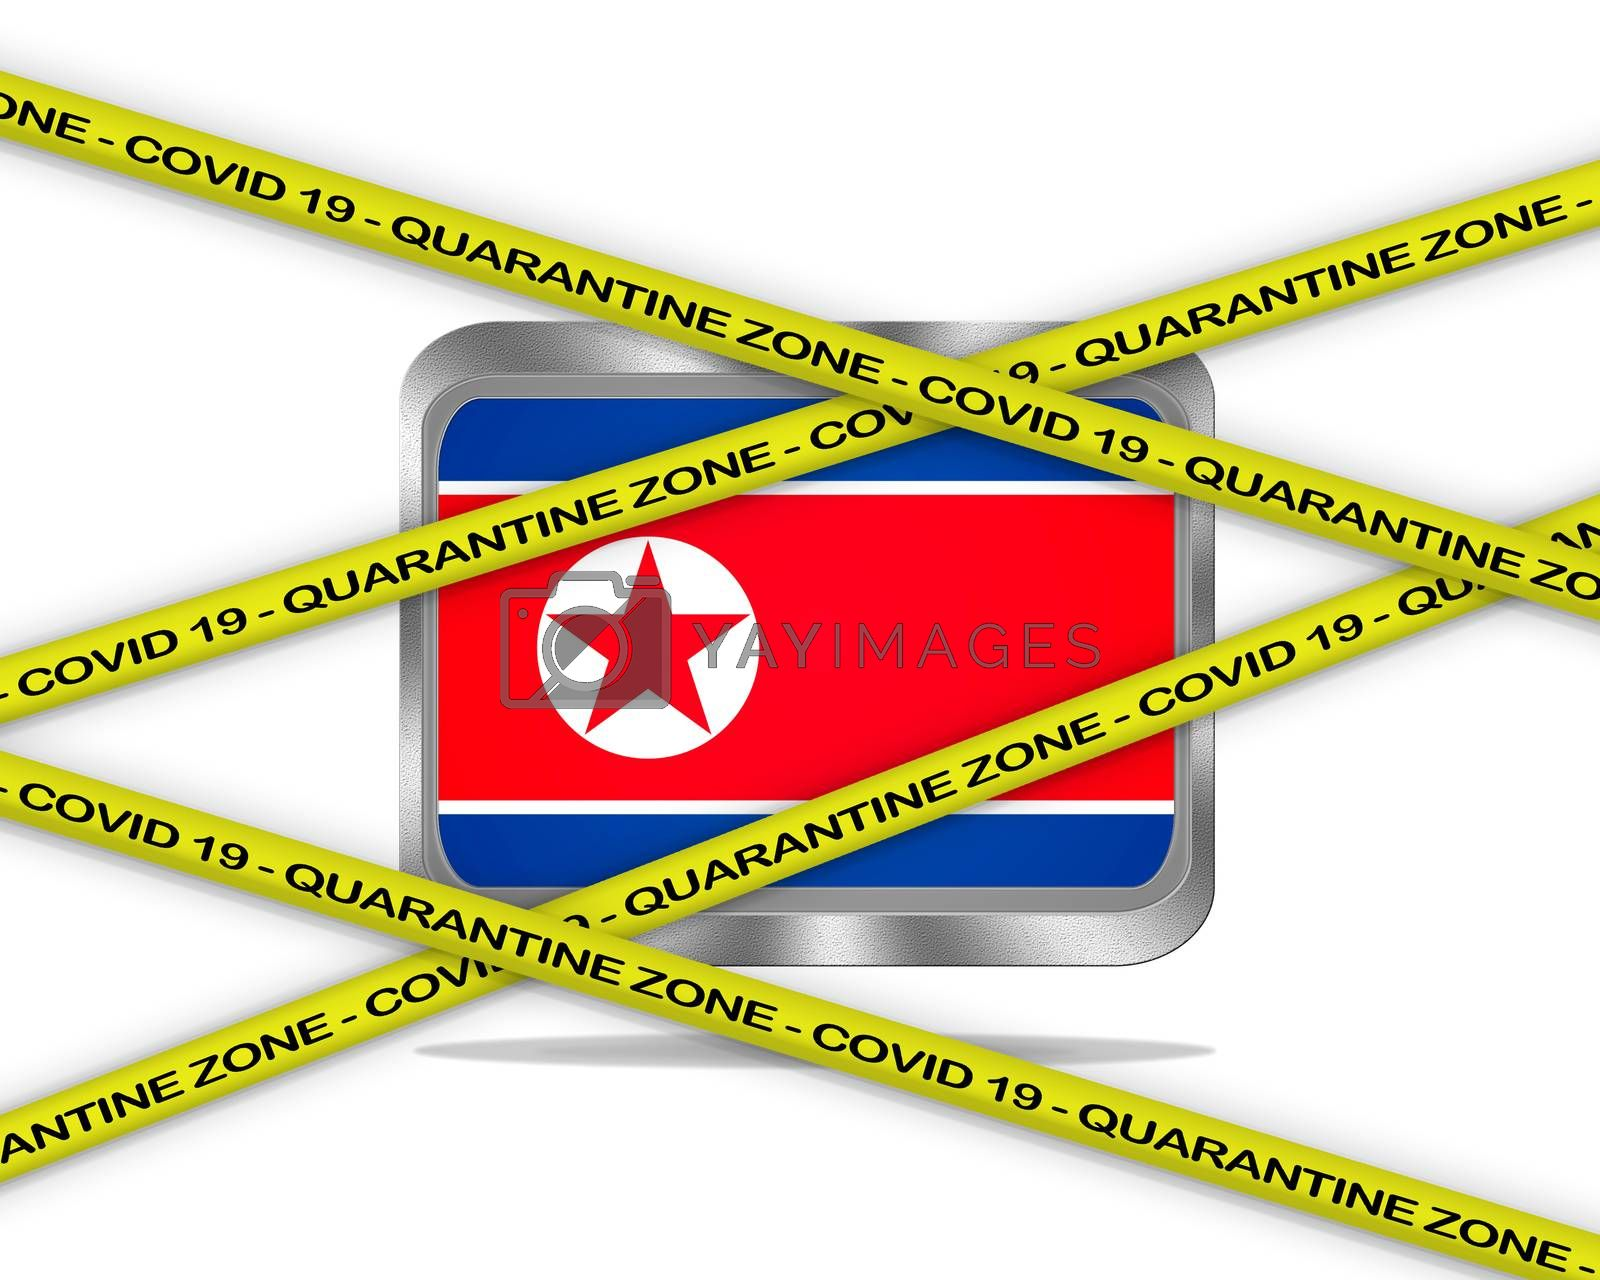 COVID-19 warning yellow ribbon written with: Quarantine zone Cover 19 on North Korea flag illustration. Coronavirus danger area, quarantined country.